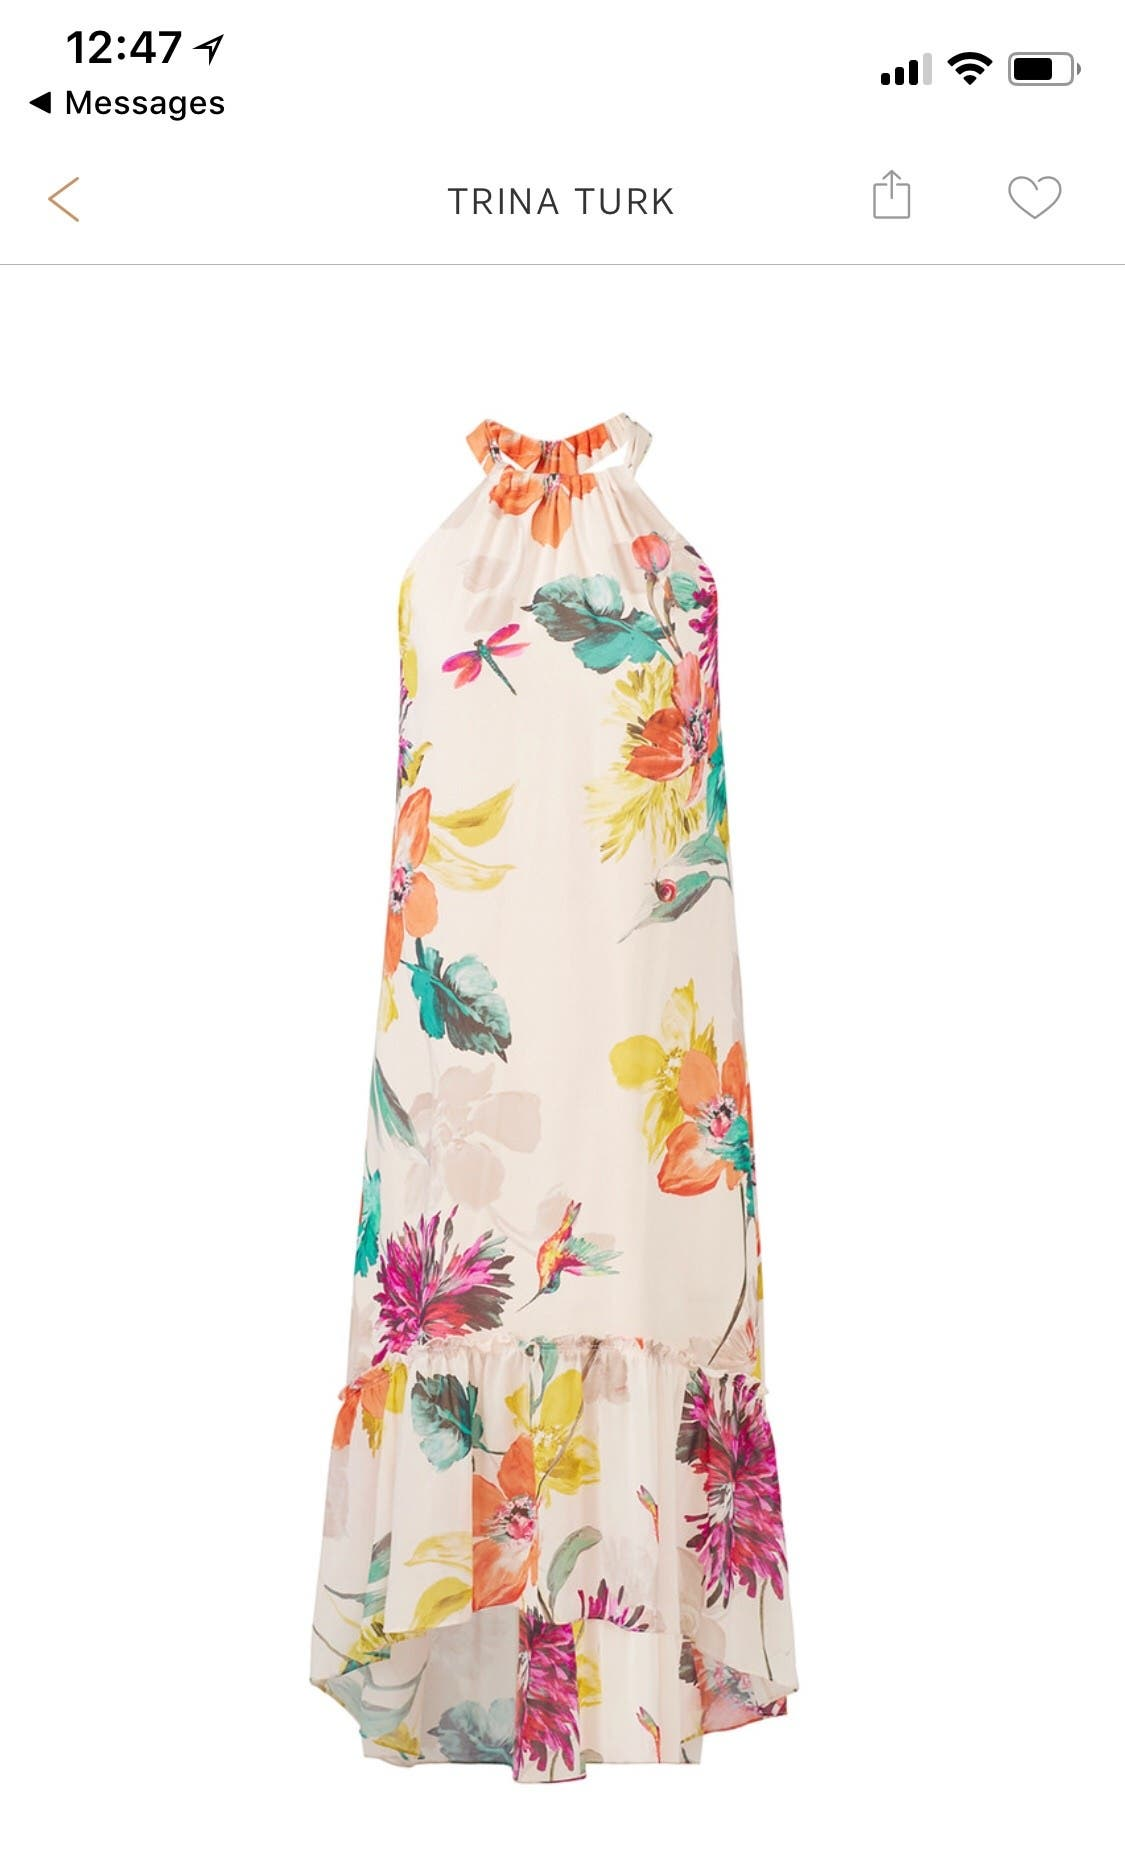 b4855b57b6c Floral Rosales Dress by Trina Turk for  55